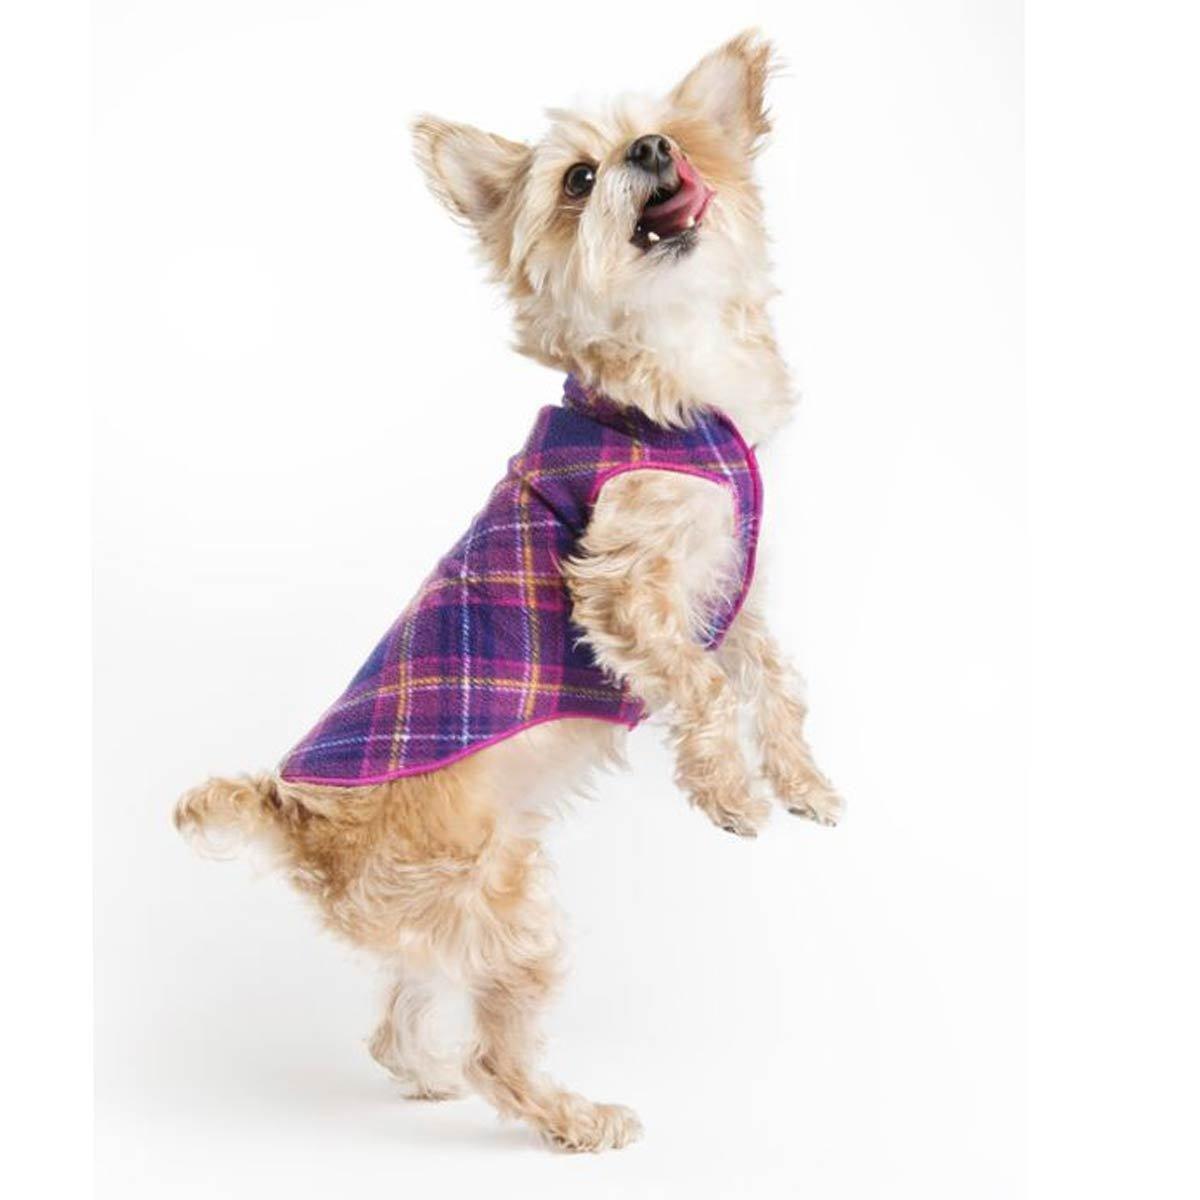 Gold Paw Stretch Blue Fleece Dog Coat - Soft, Warm Dog Clothes, Stretchy Pet Sweater - Machine Washable, Eco Friendly - All Season - Sizes 2-33, Mulberry Plaid, Size 8